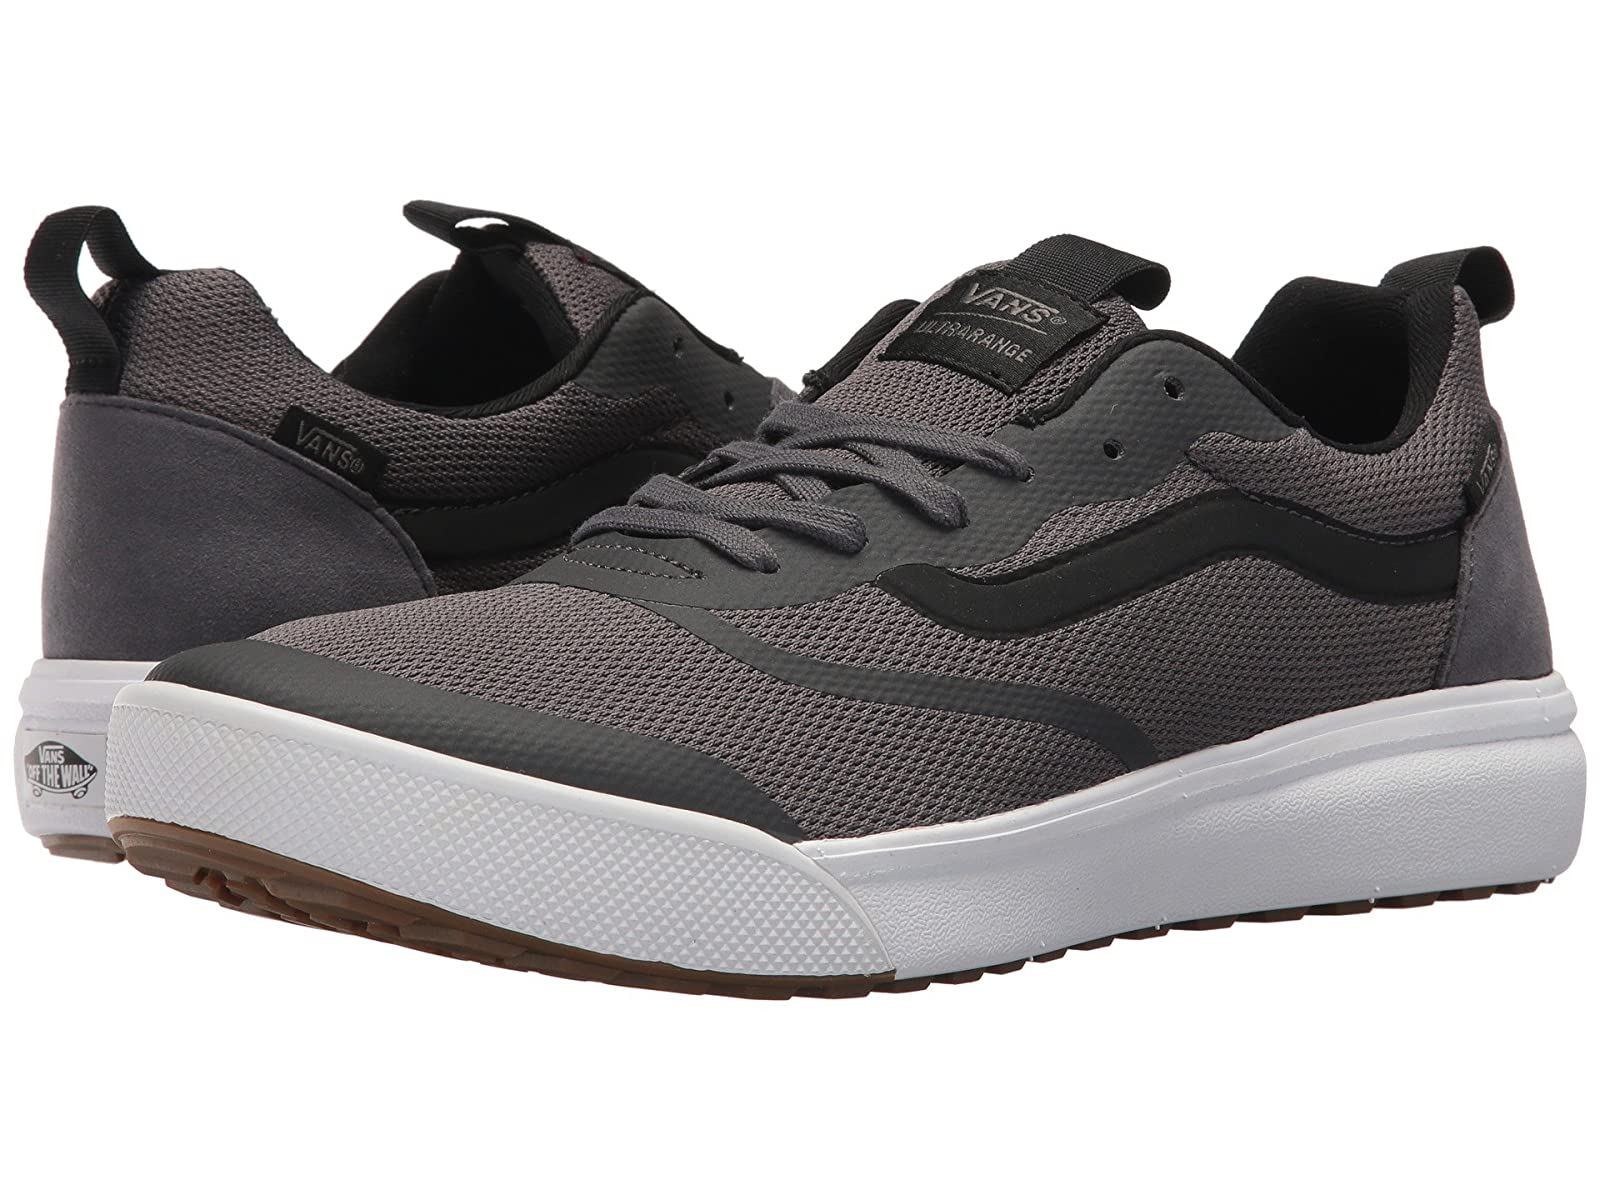 Vans UltraRange Rapidweld '18Atmospheric grades have affordable shoes